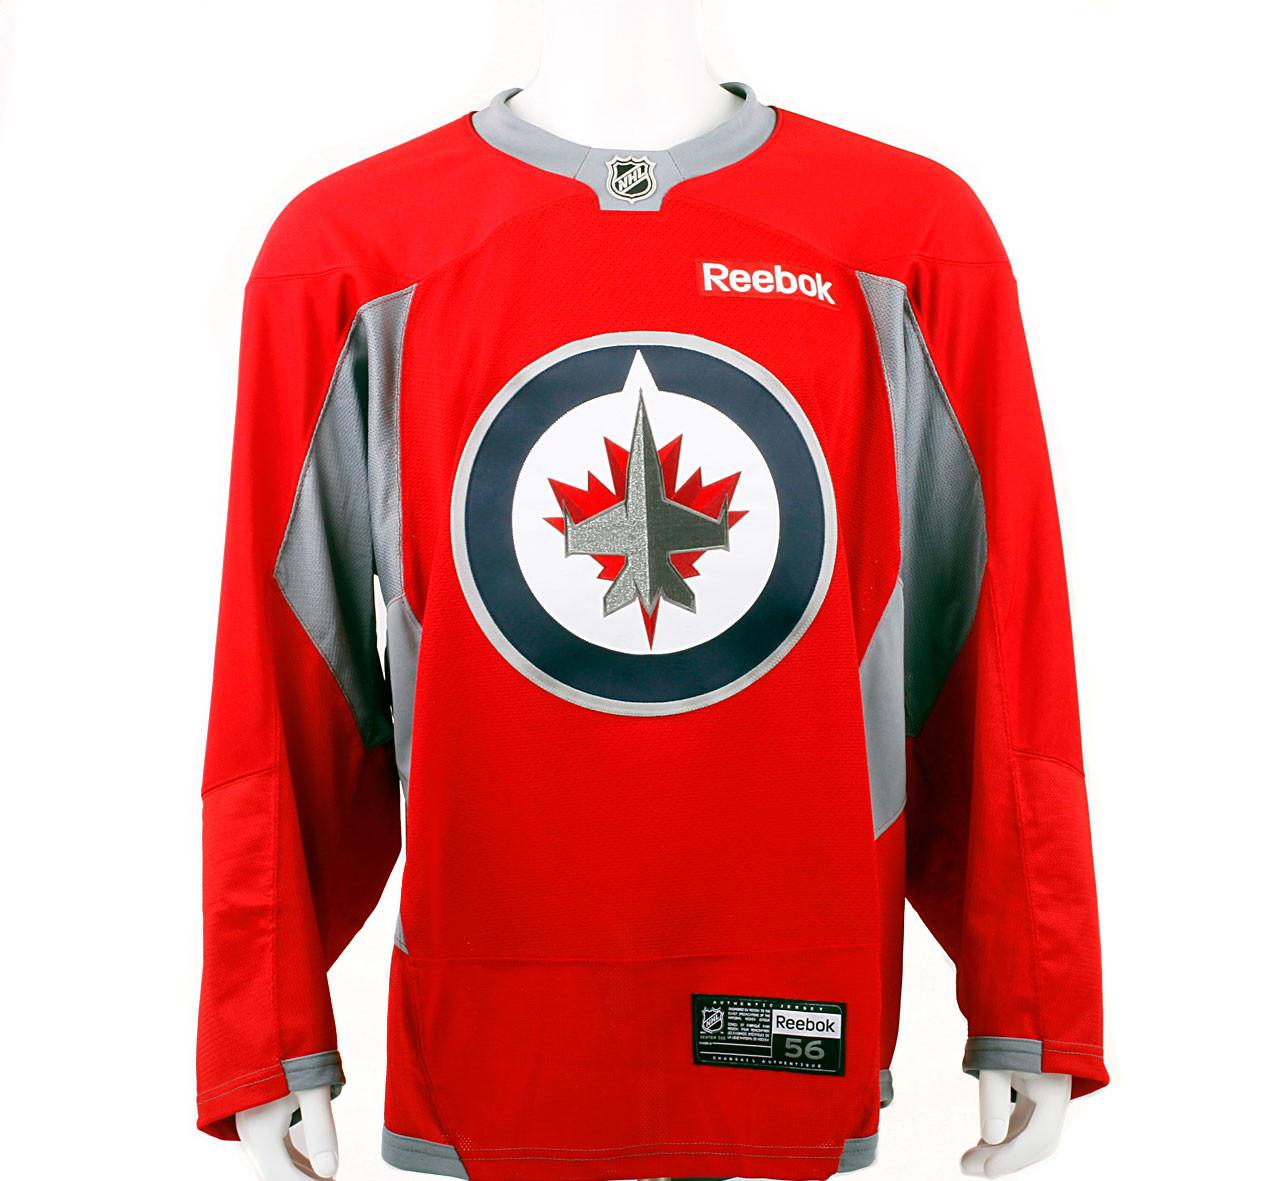 ed73b13ecd6 ... promo code for practice jersey winnipeg jets red reebok size 56 pro  stock hockey 39613 a6b79